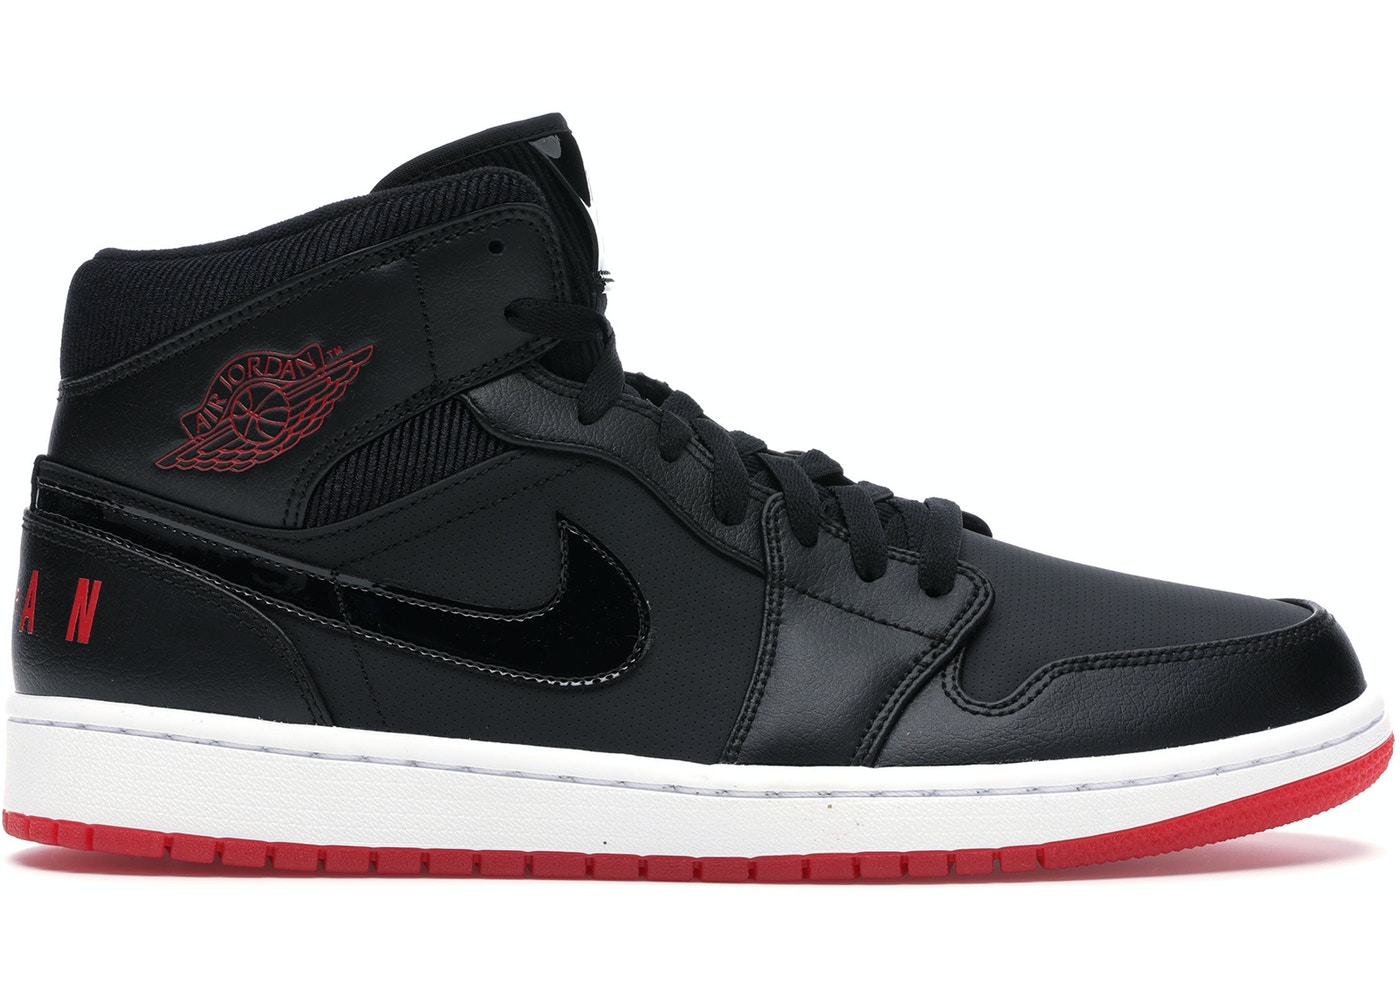 Jordan 1 Mid Black University Red Bq6578 001